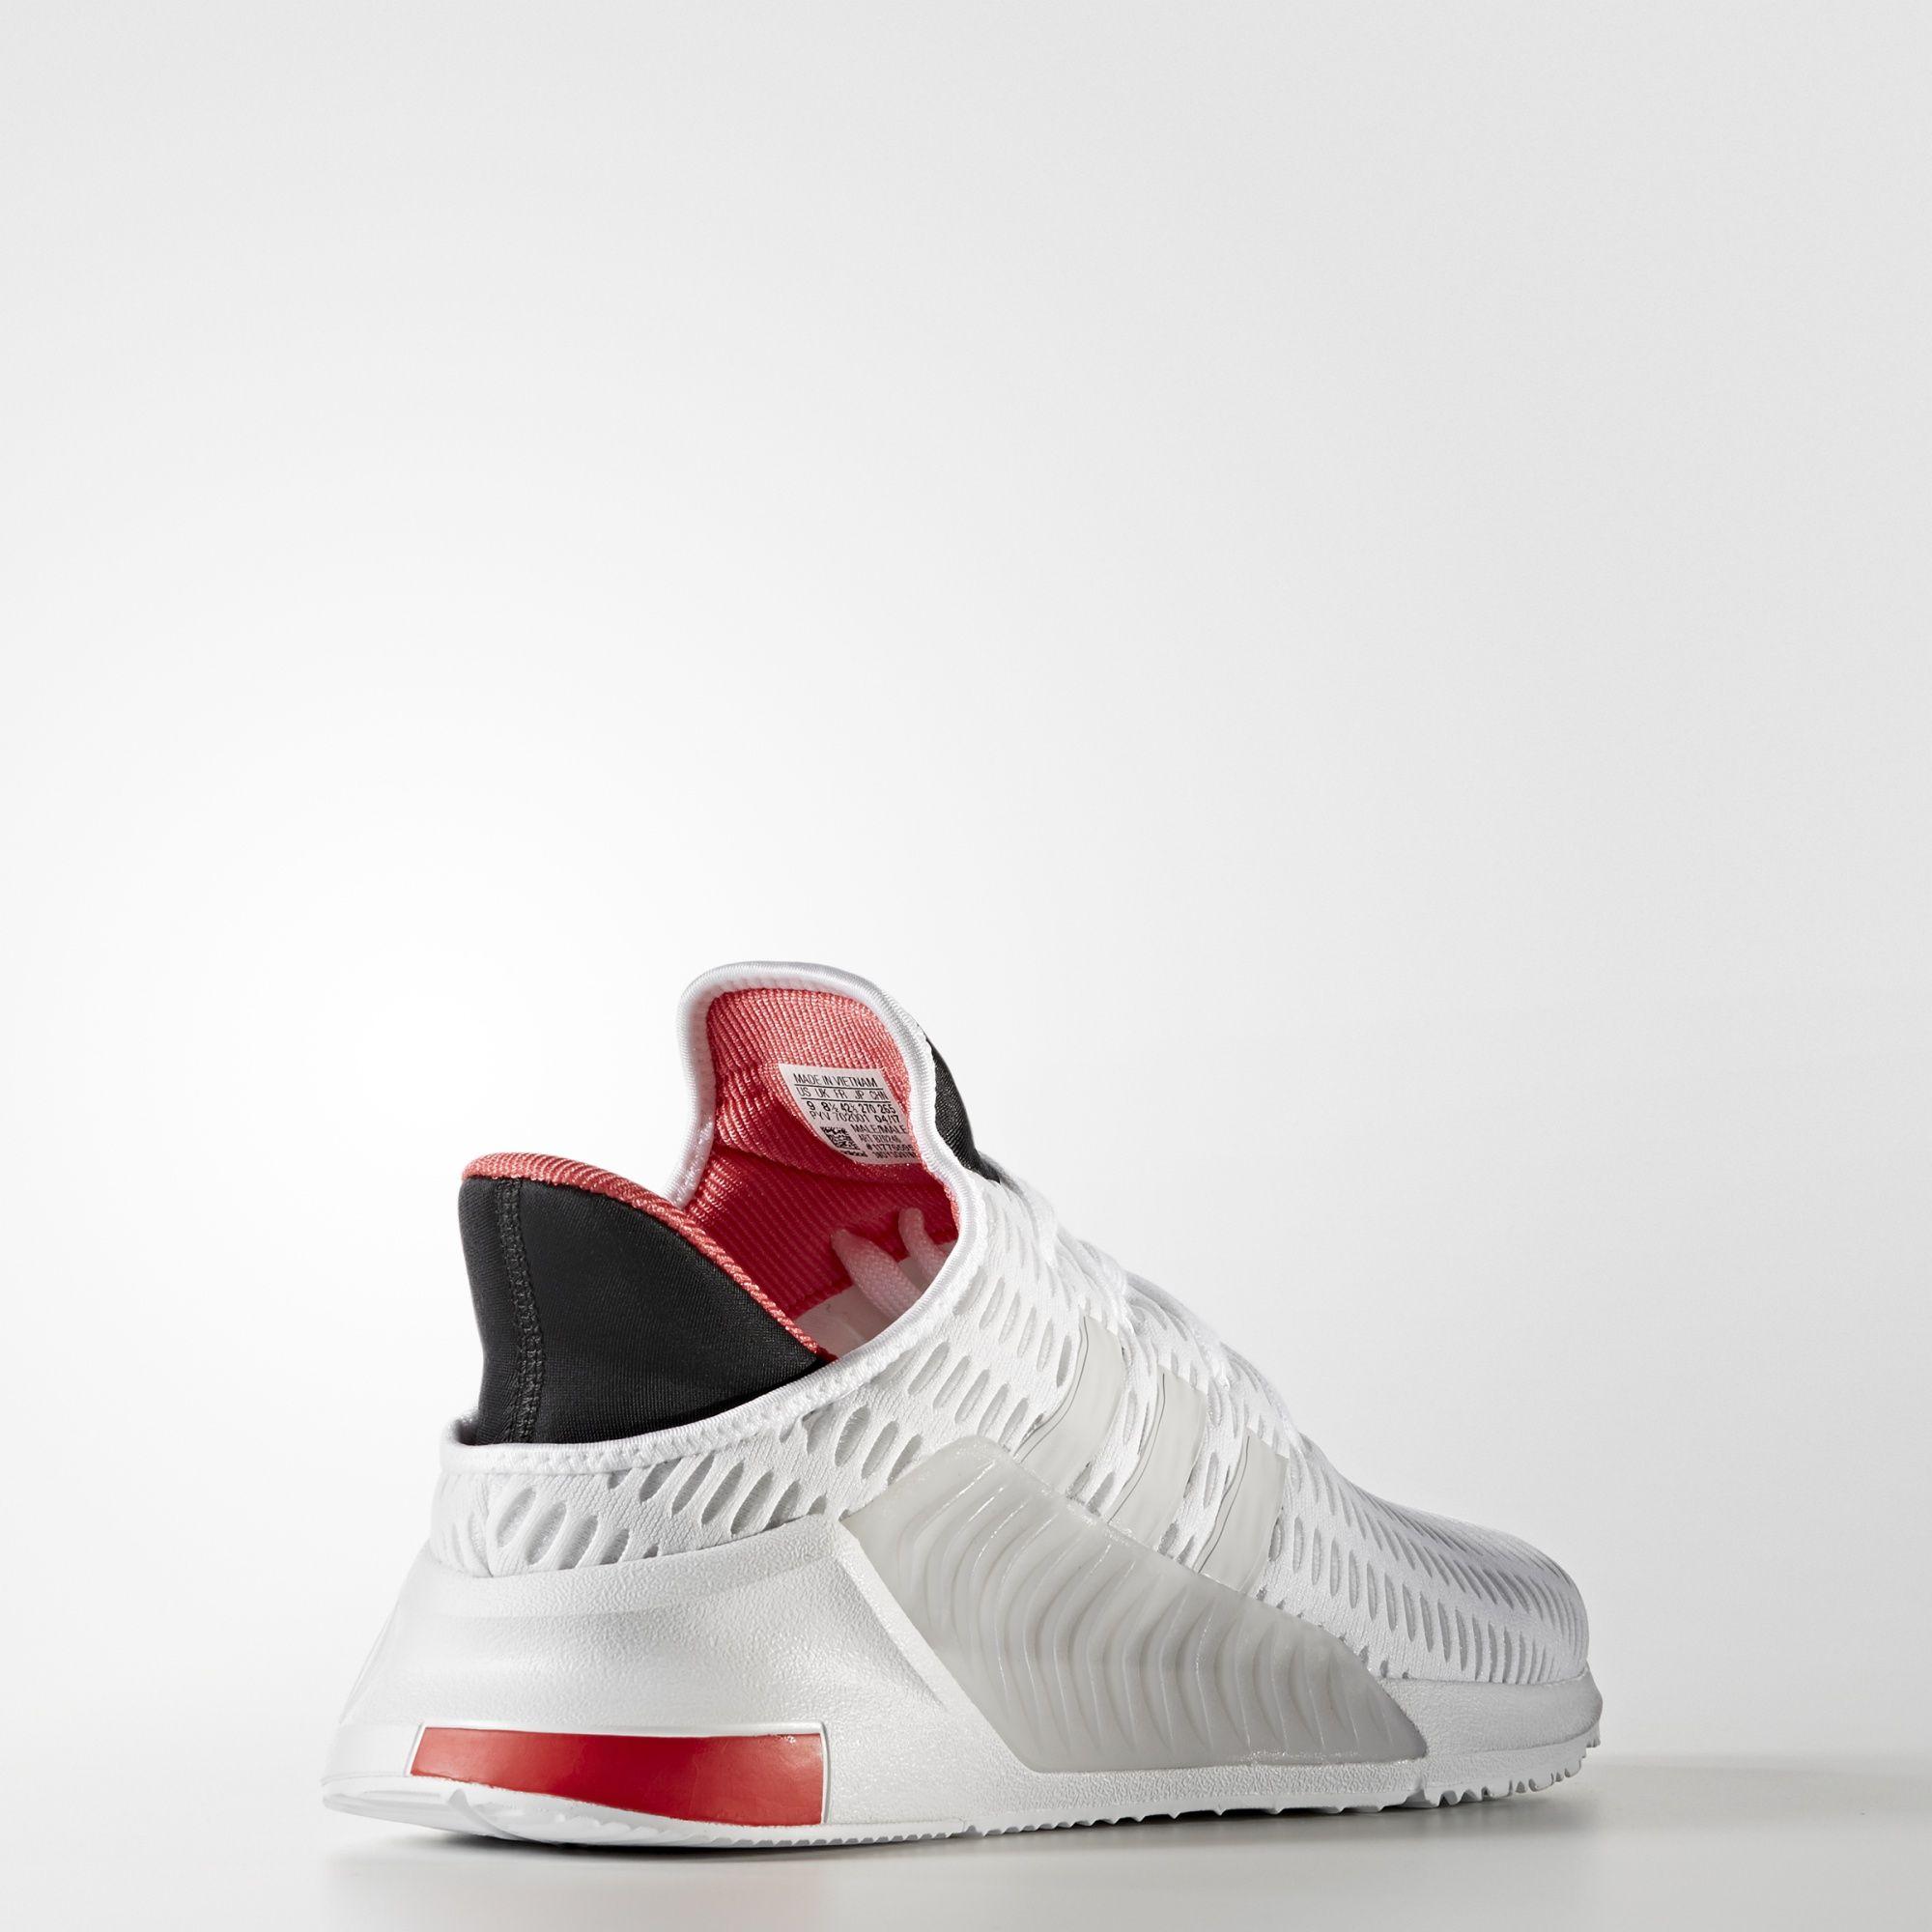 BZ0246 adidas Climacool 02.17 White Grey 4